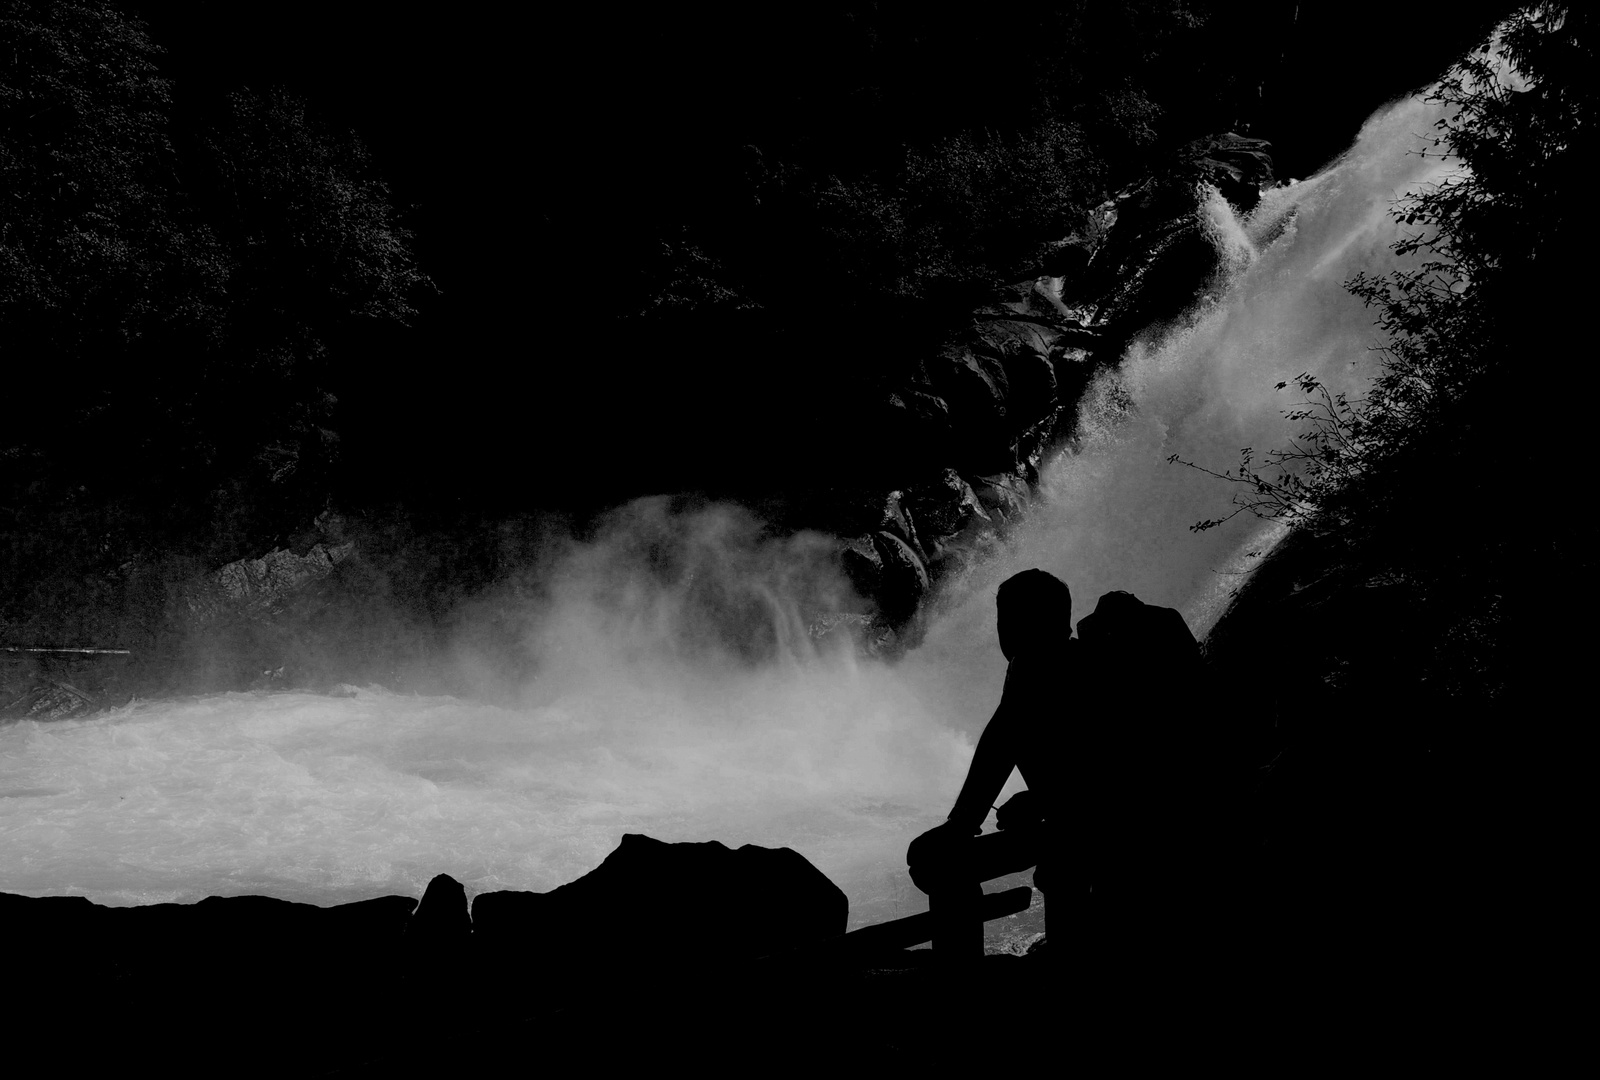 Krimler Wasserfälle